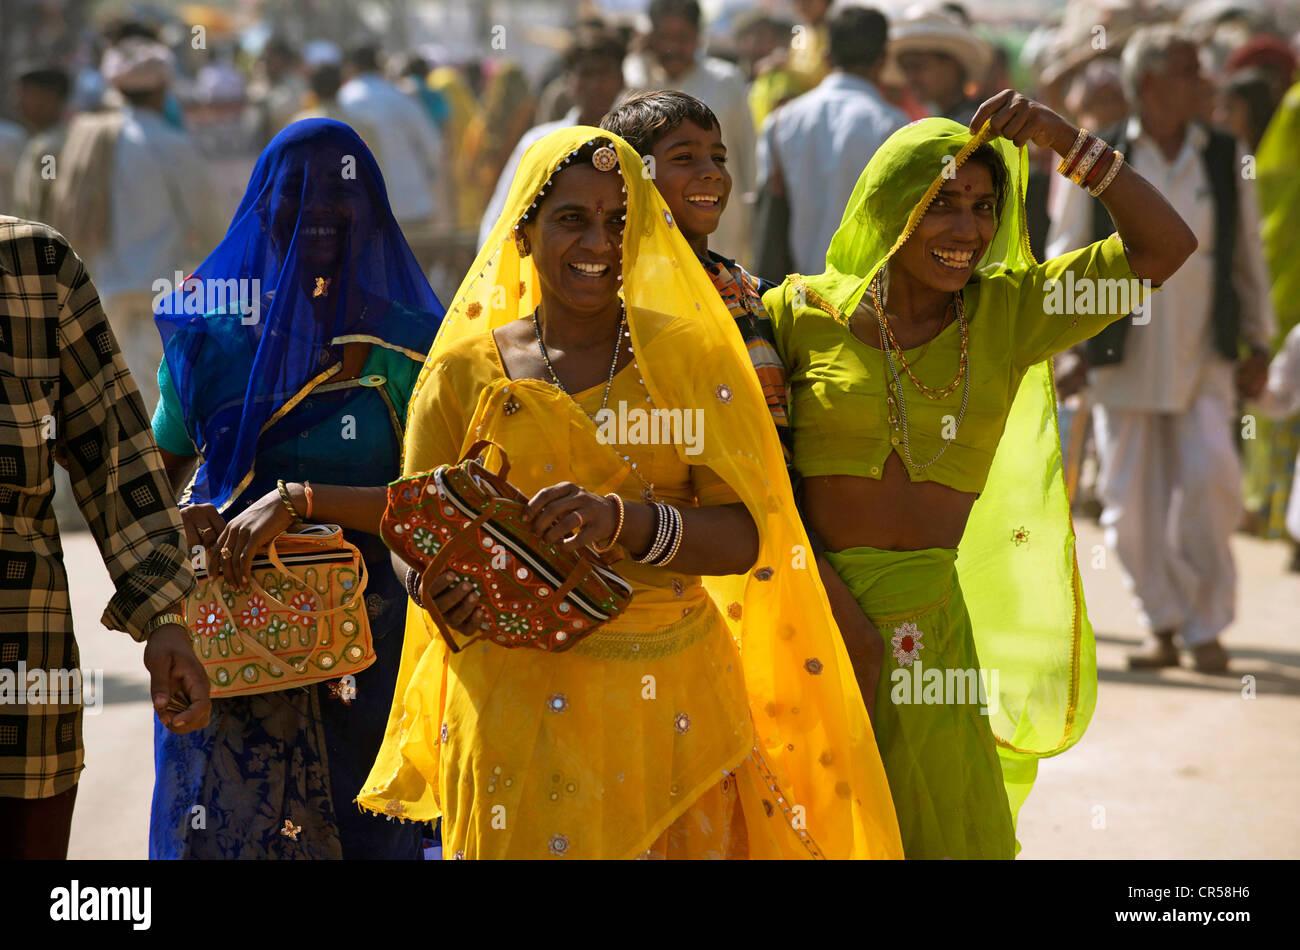 L'Inde, Rajasthan, Pushkar, pendant la foire de Pushkar Photo Stock